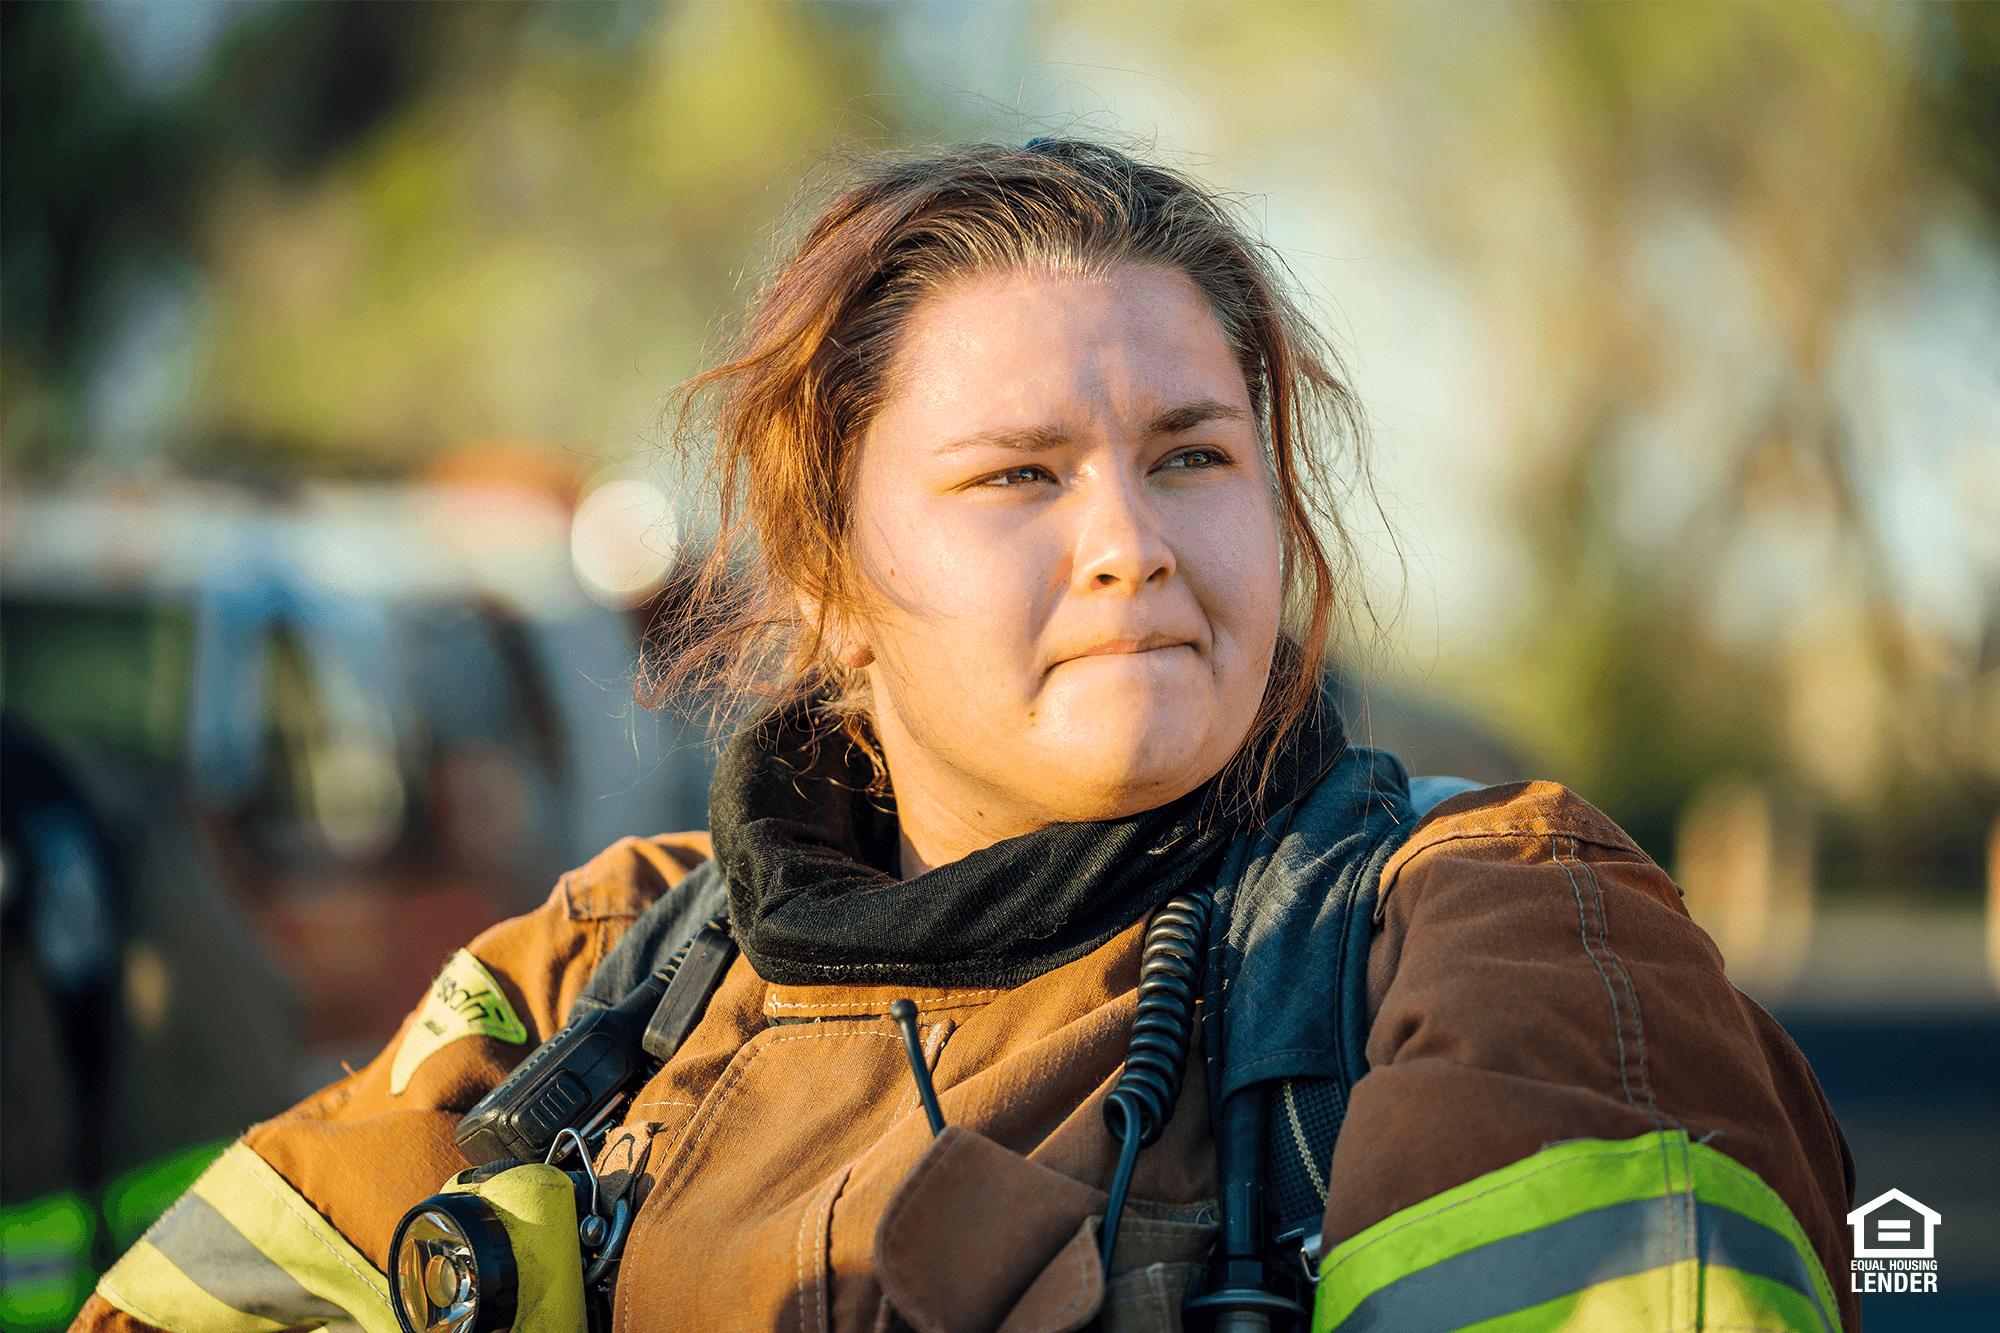 First responder firefighter at work